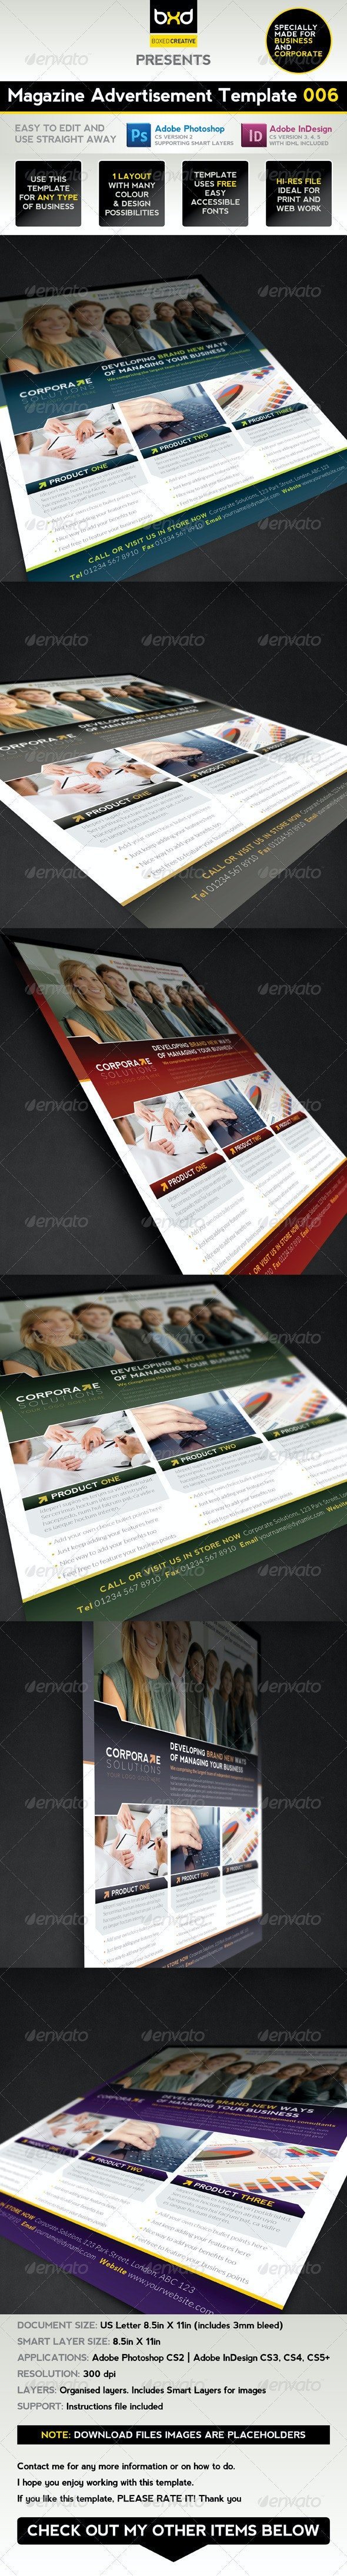 Magazine Advert Template 006 - Corporate Flyers